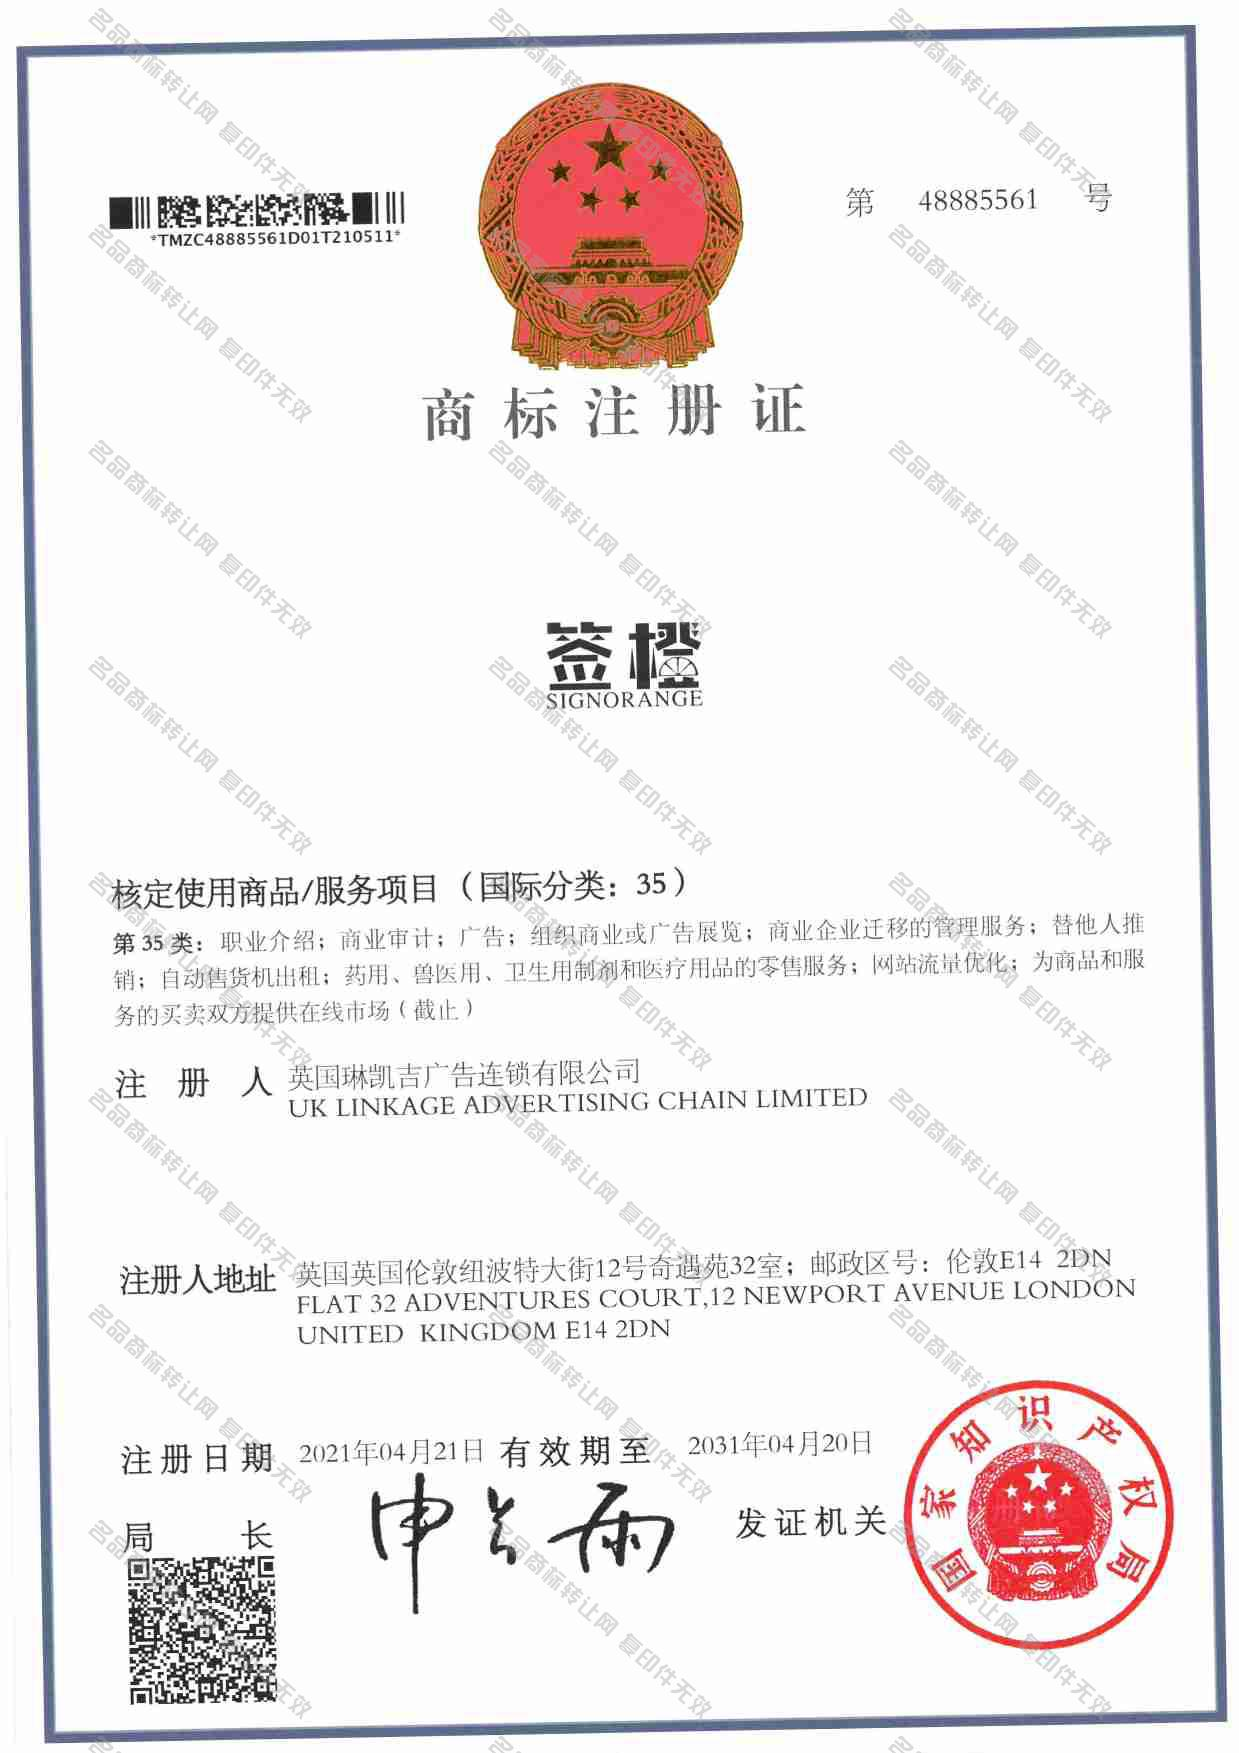 签橙 SIGNORANGE注册证